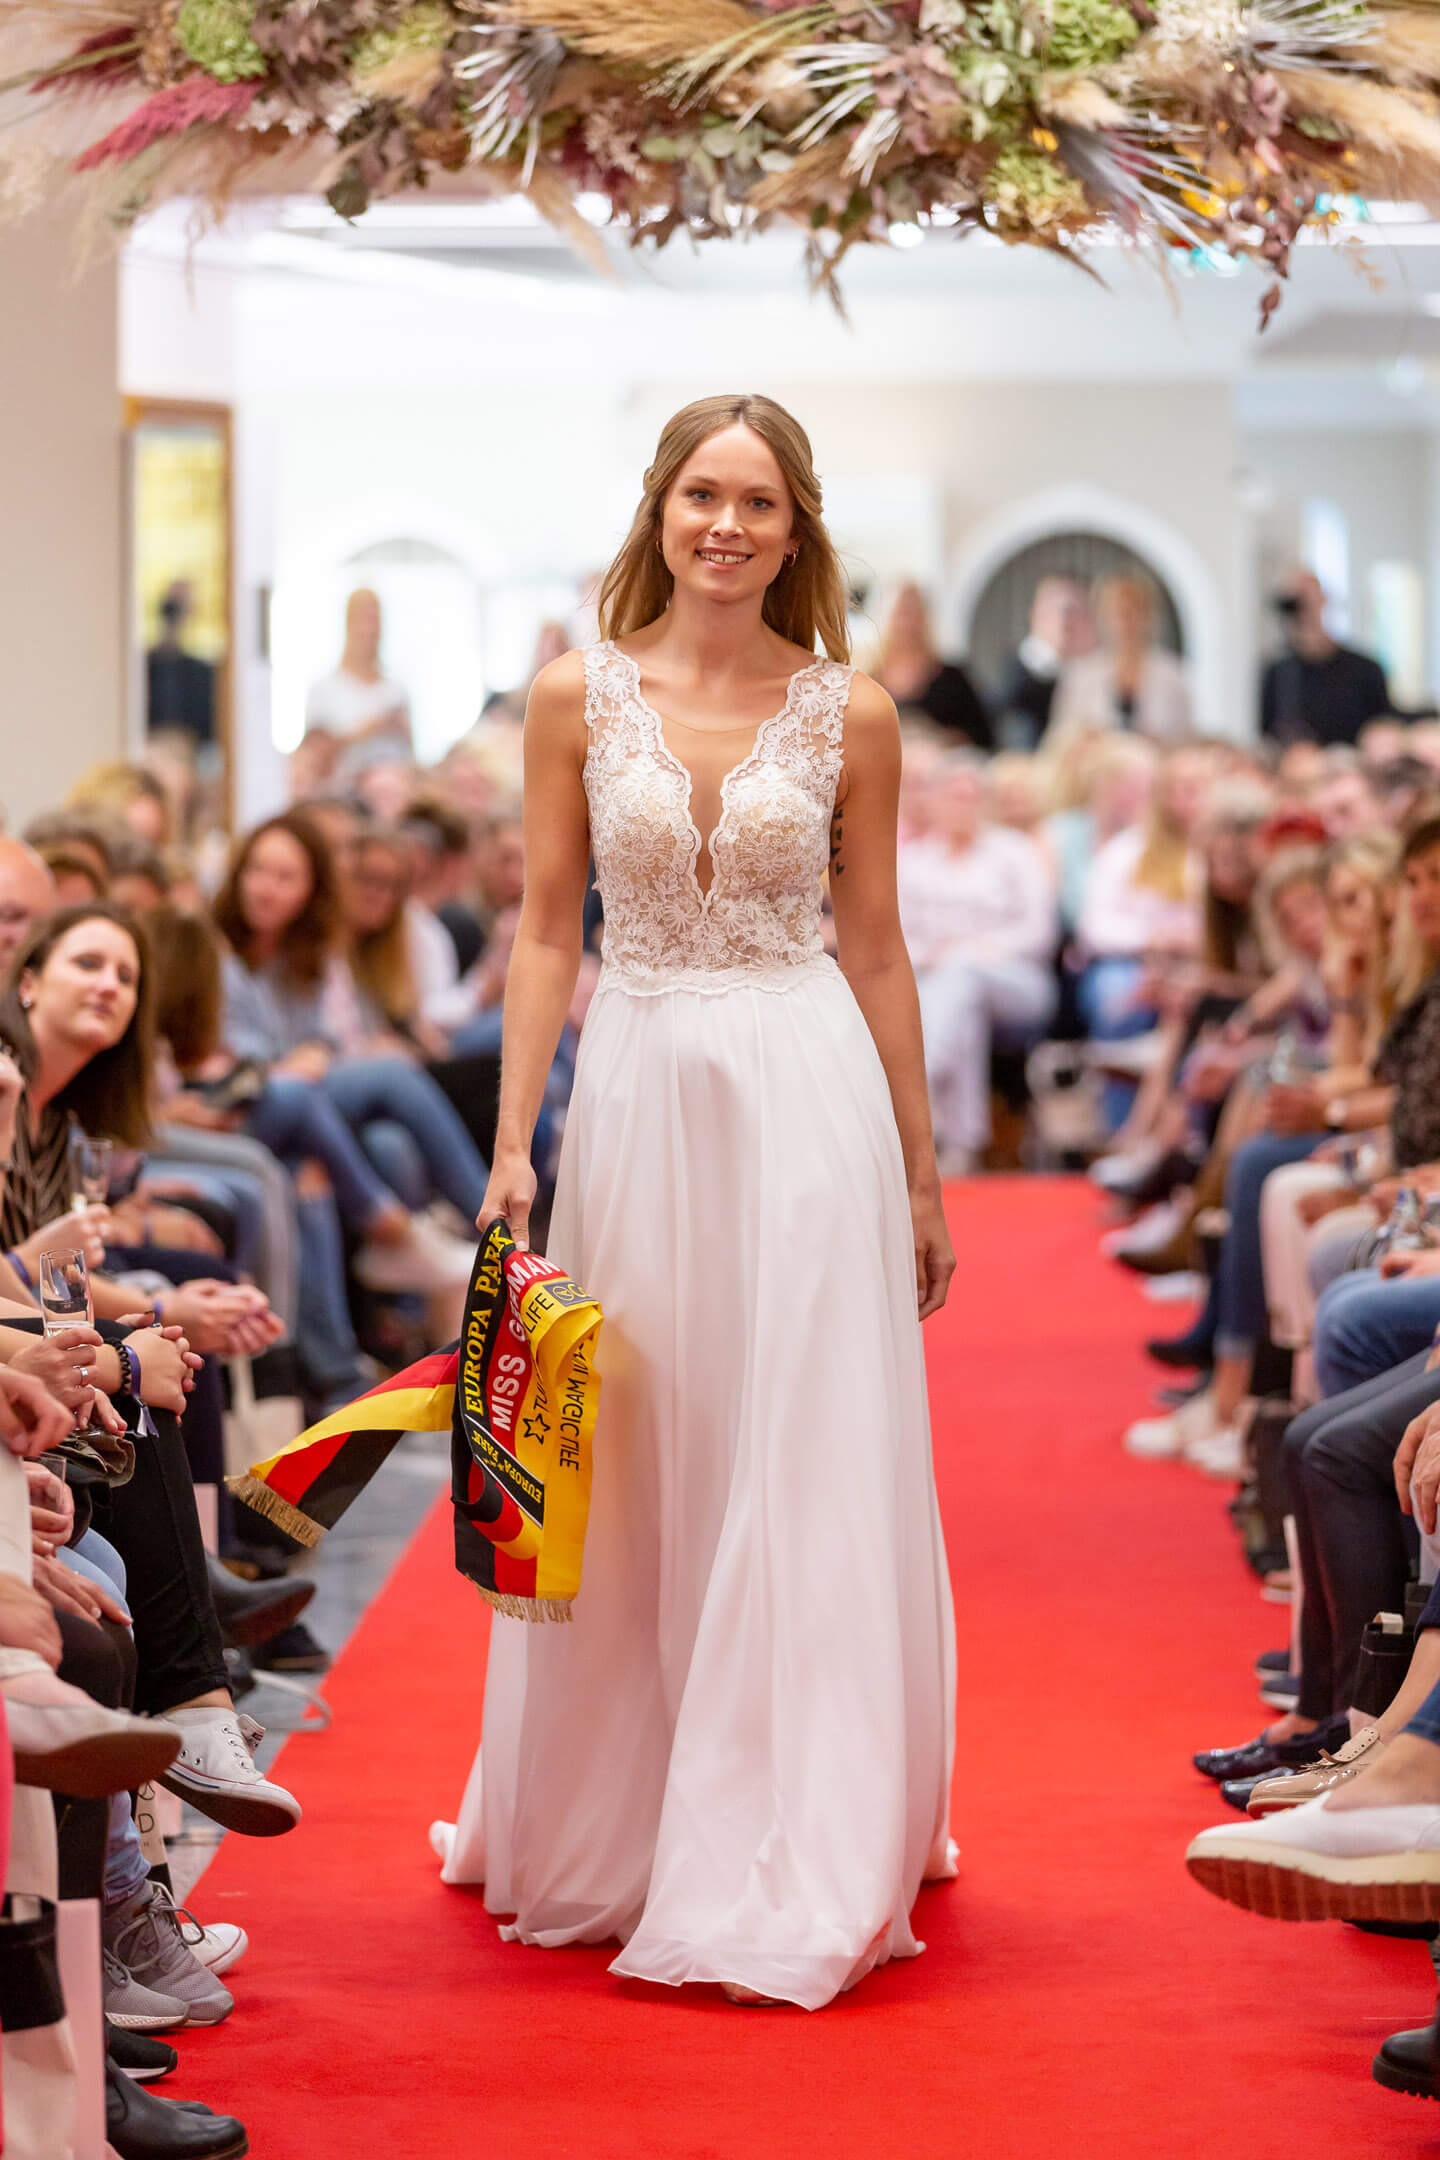 Miss Germany 2019 Nadine Berneis auf der Laueland Inspo & Expo 2019 (Foto: Florian Läufer)